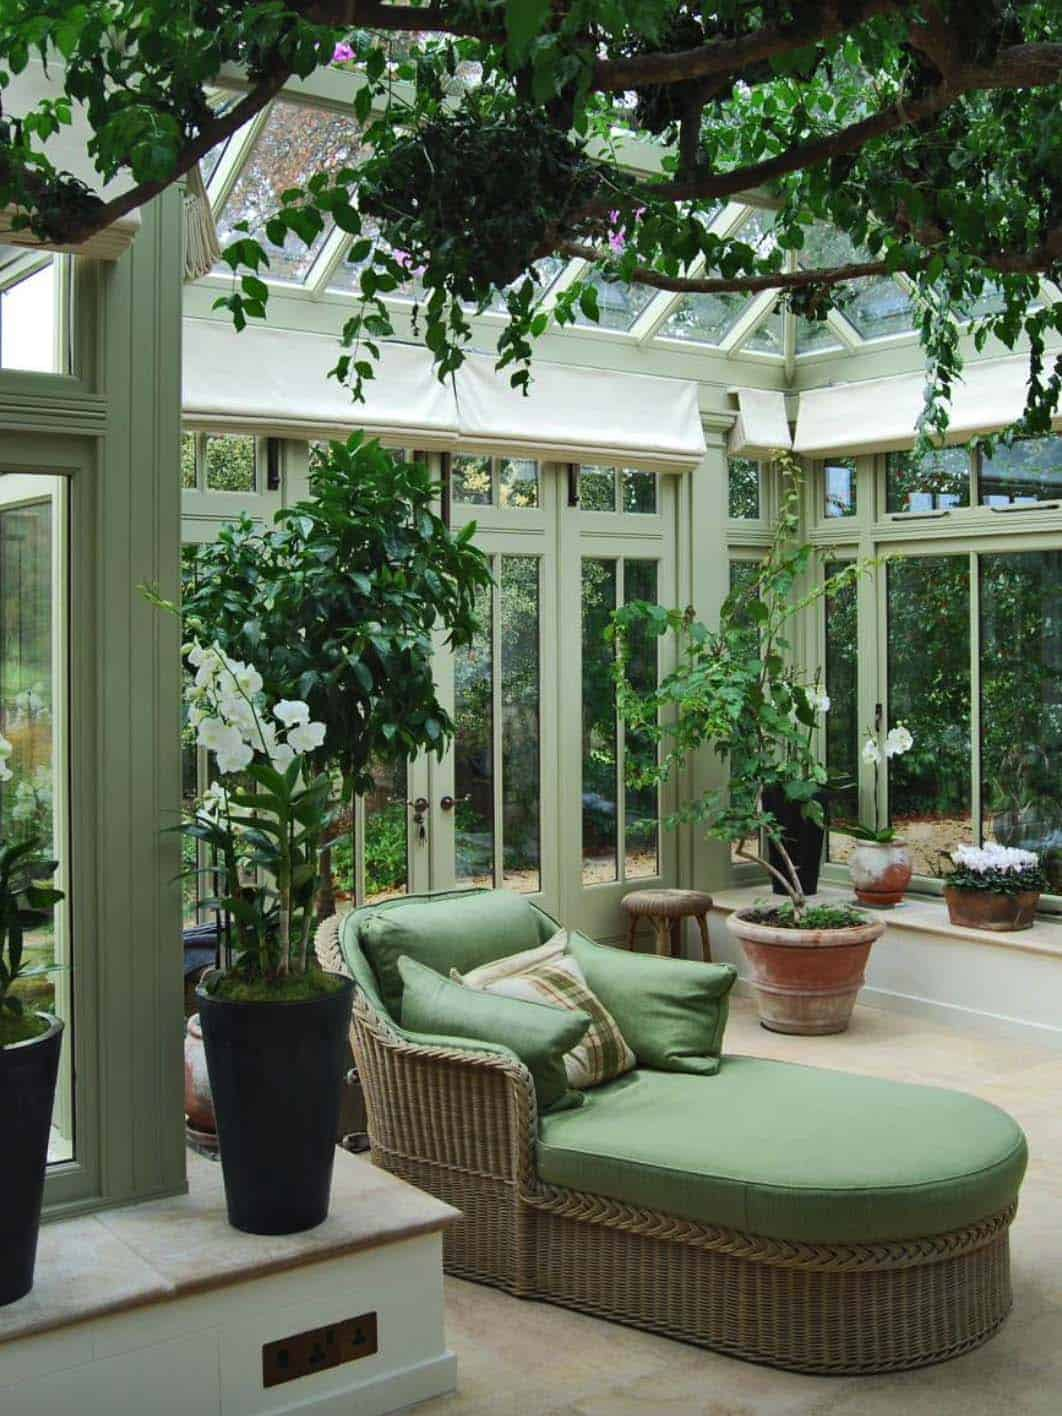 Amazing-Conservatory-Greenhouse-Ideas-13-1-Kindesign